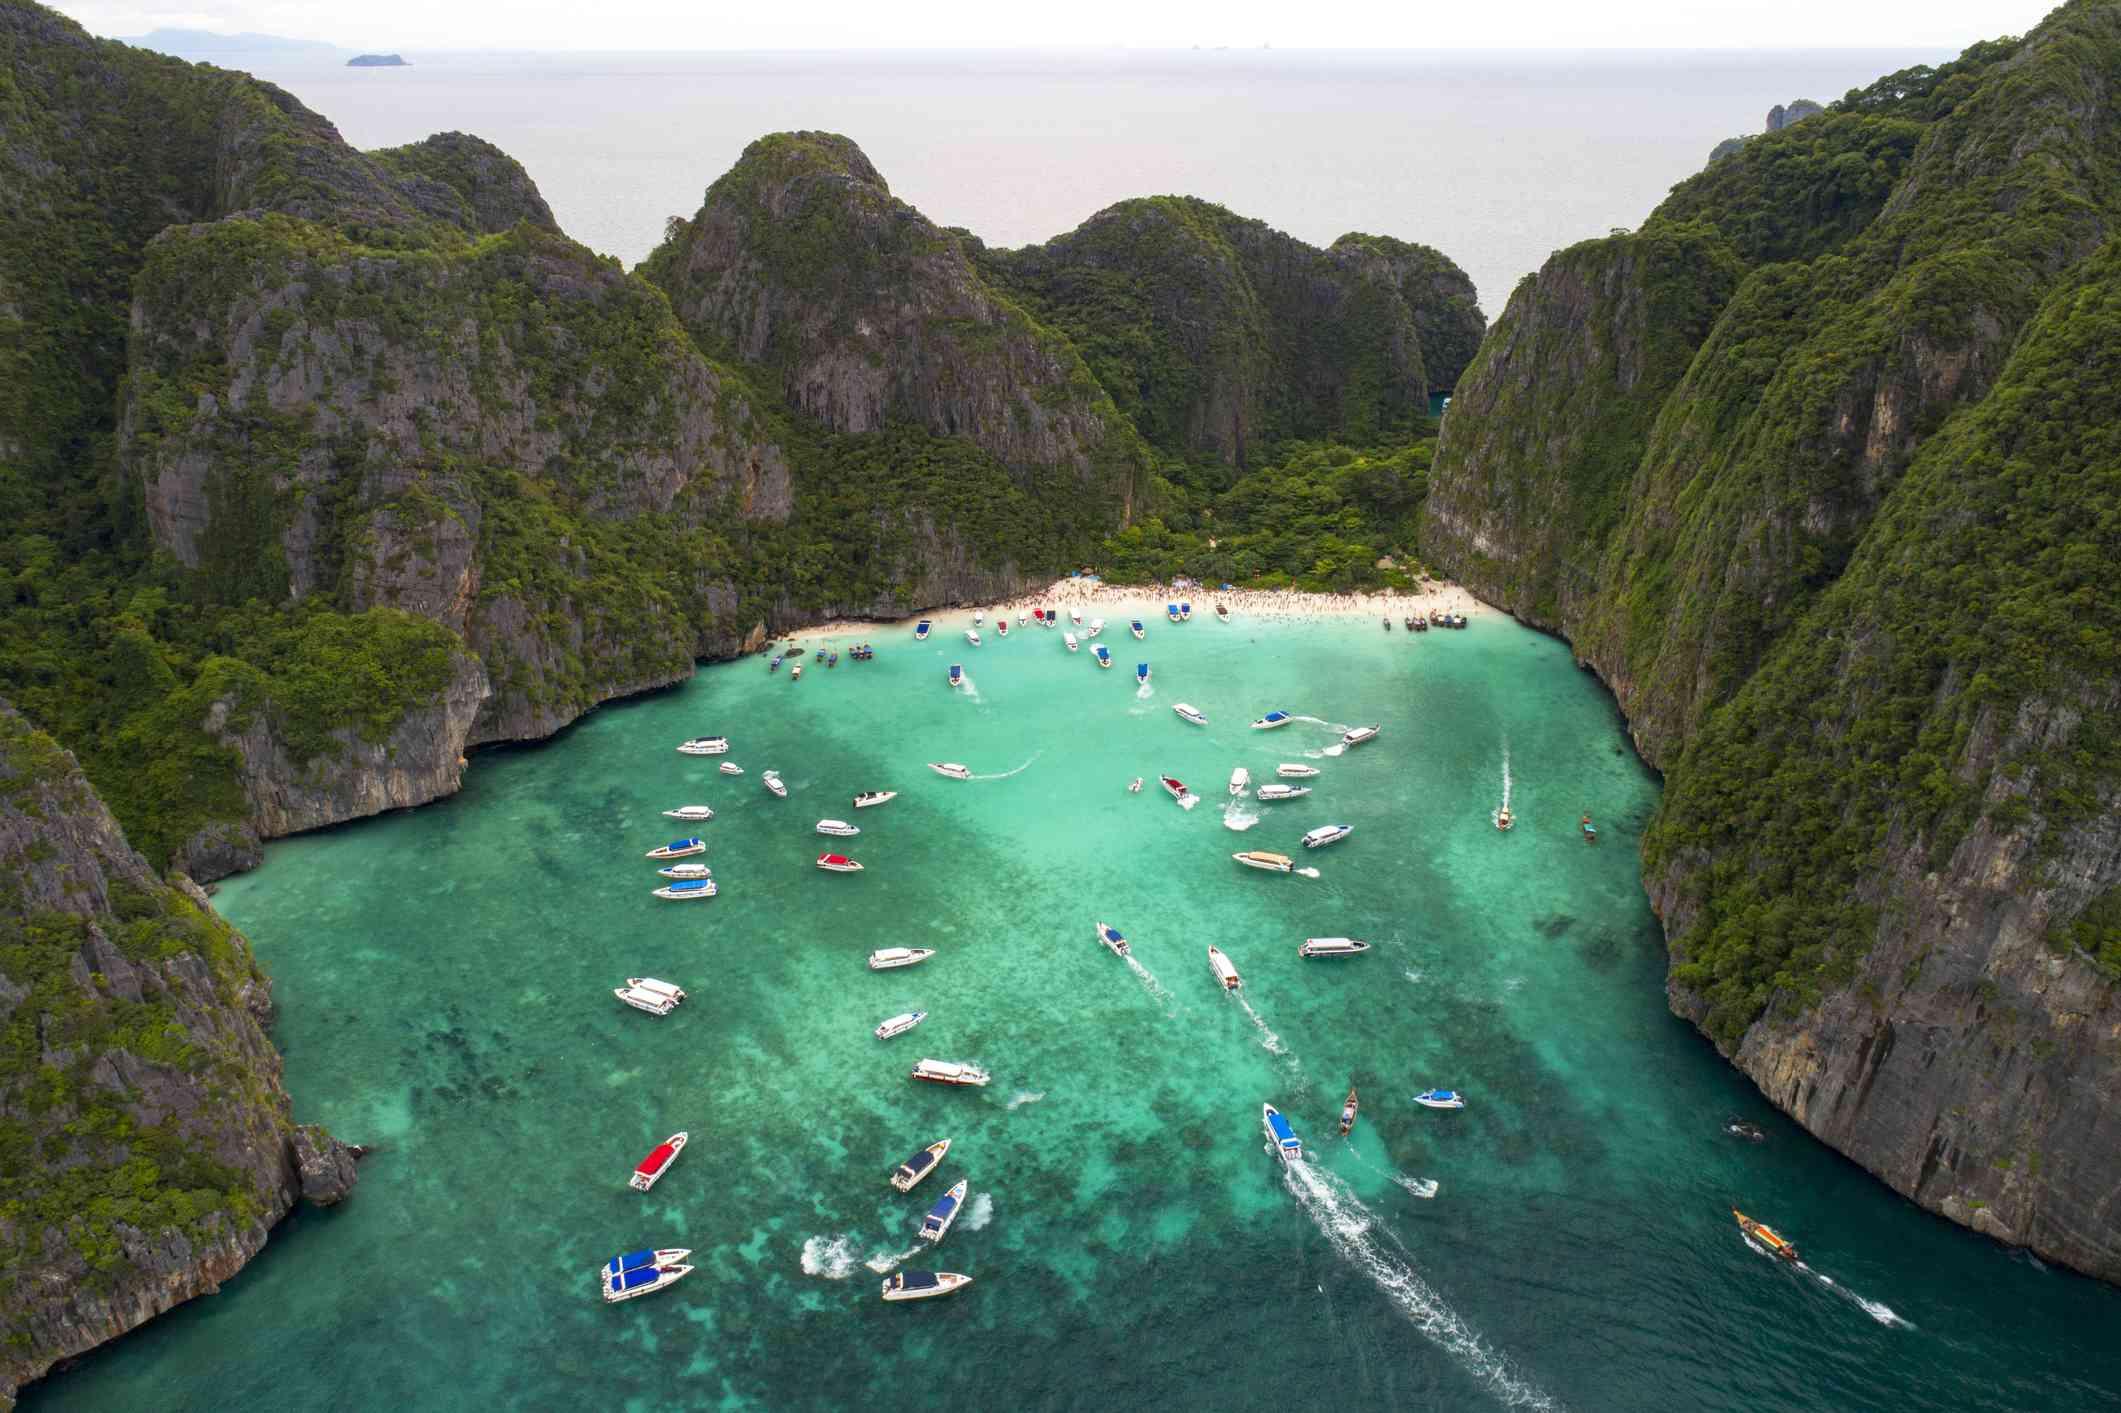 Maya Bay, Thailand, prior to closure in 2018